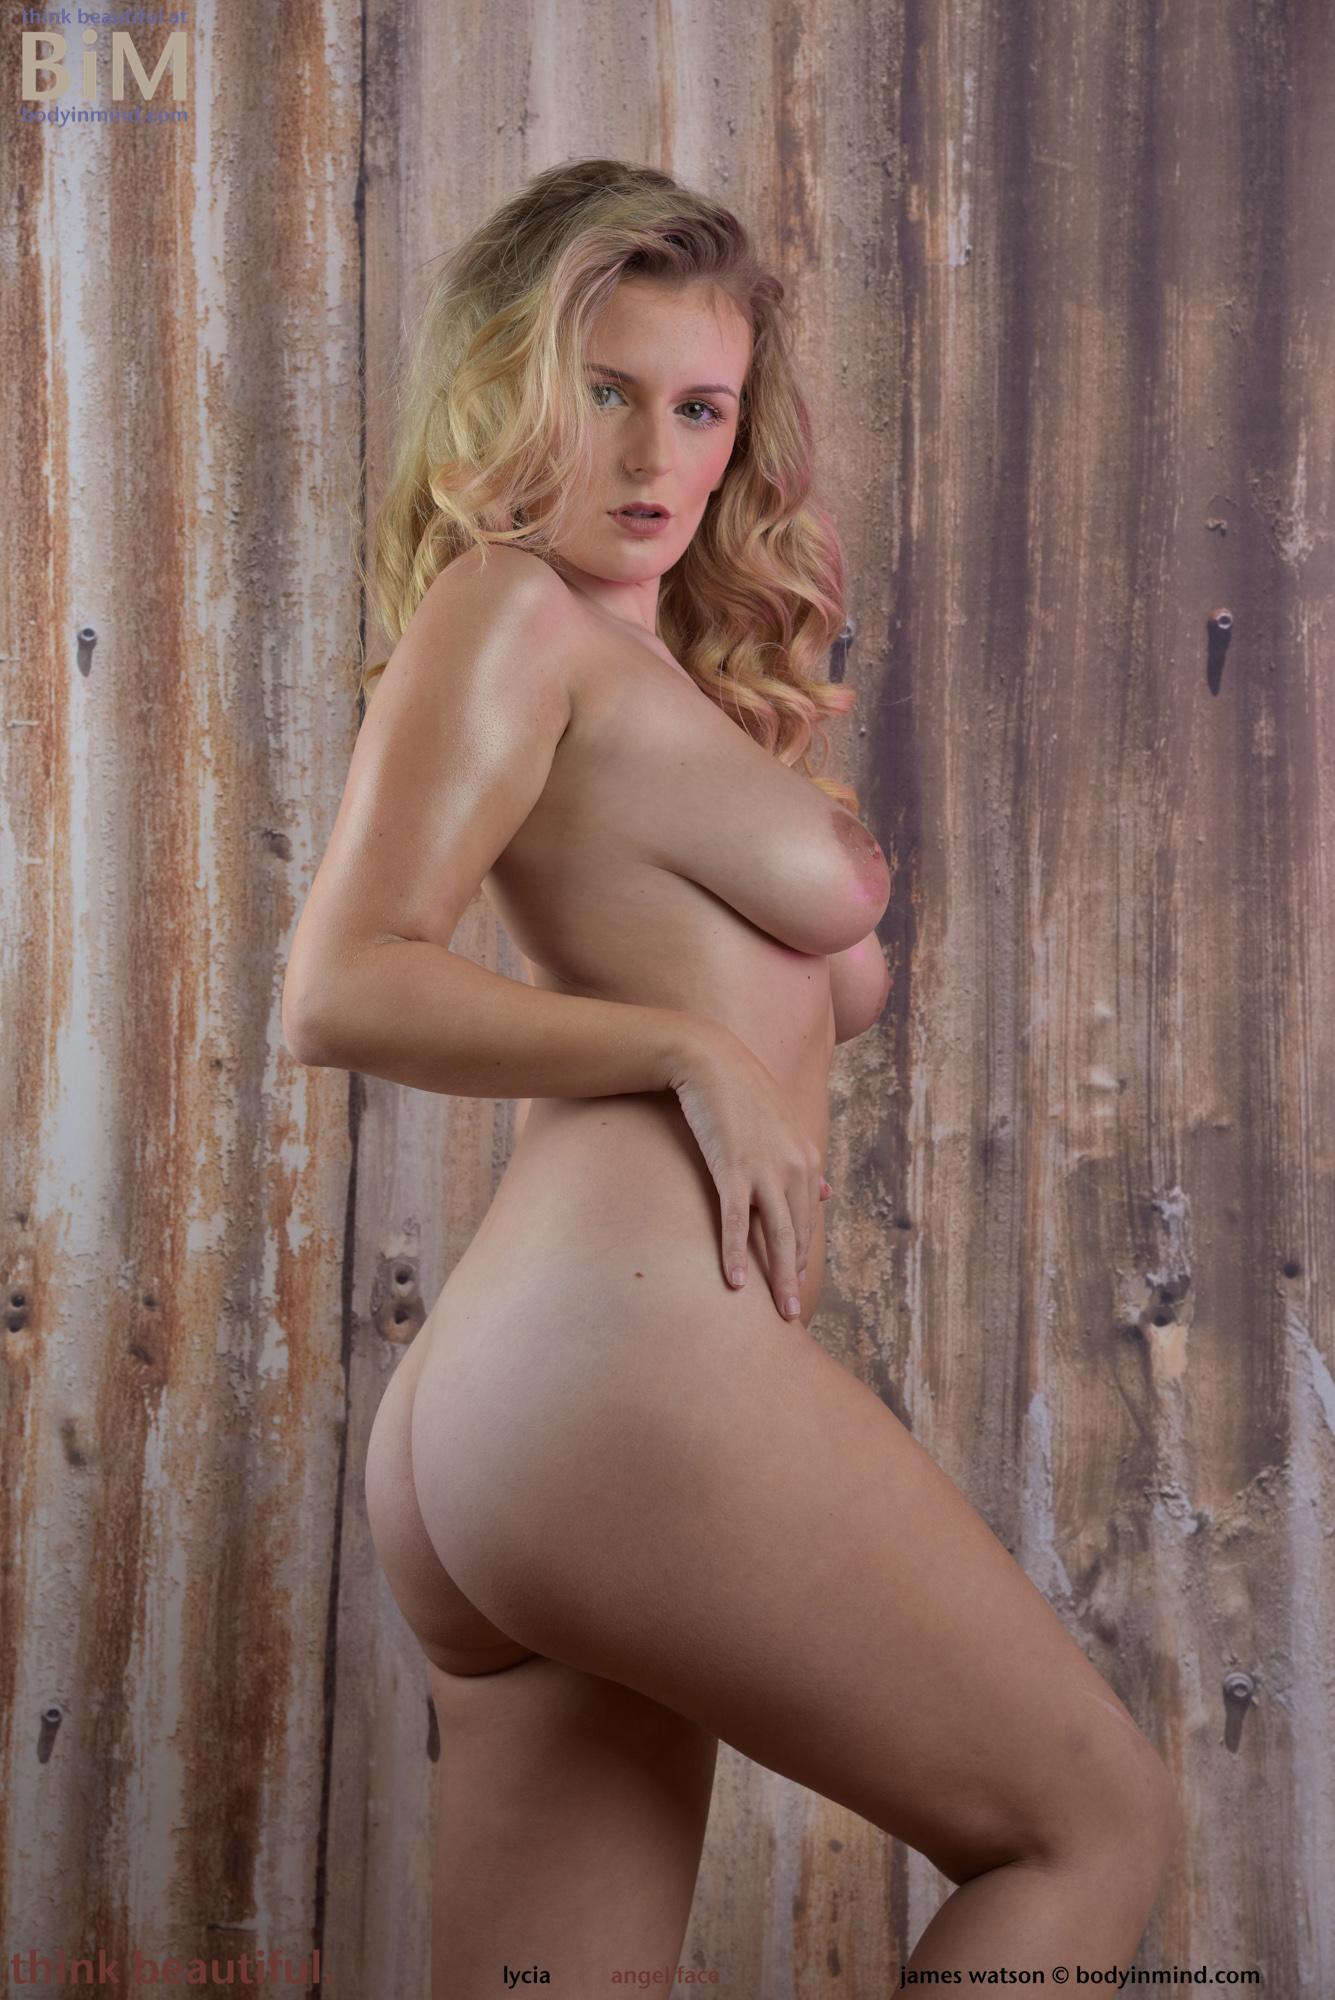 Lycia Angel Face Body In Mind